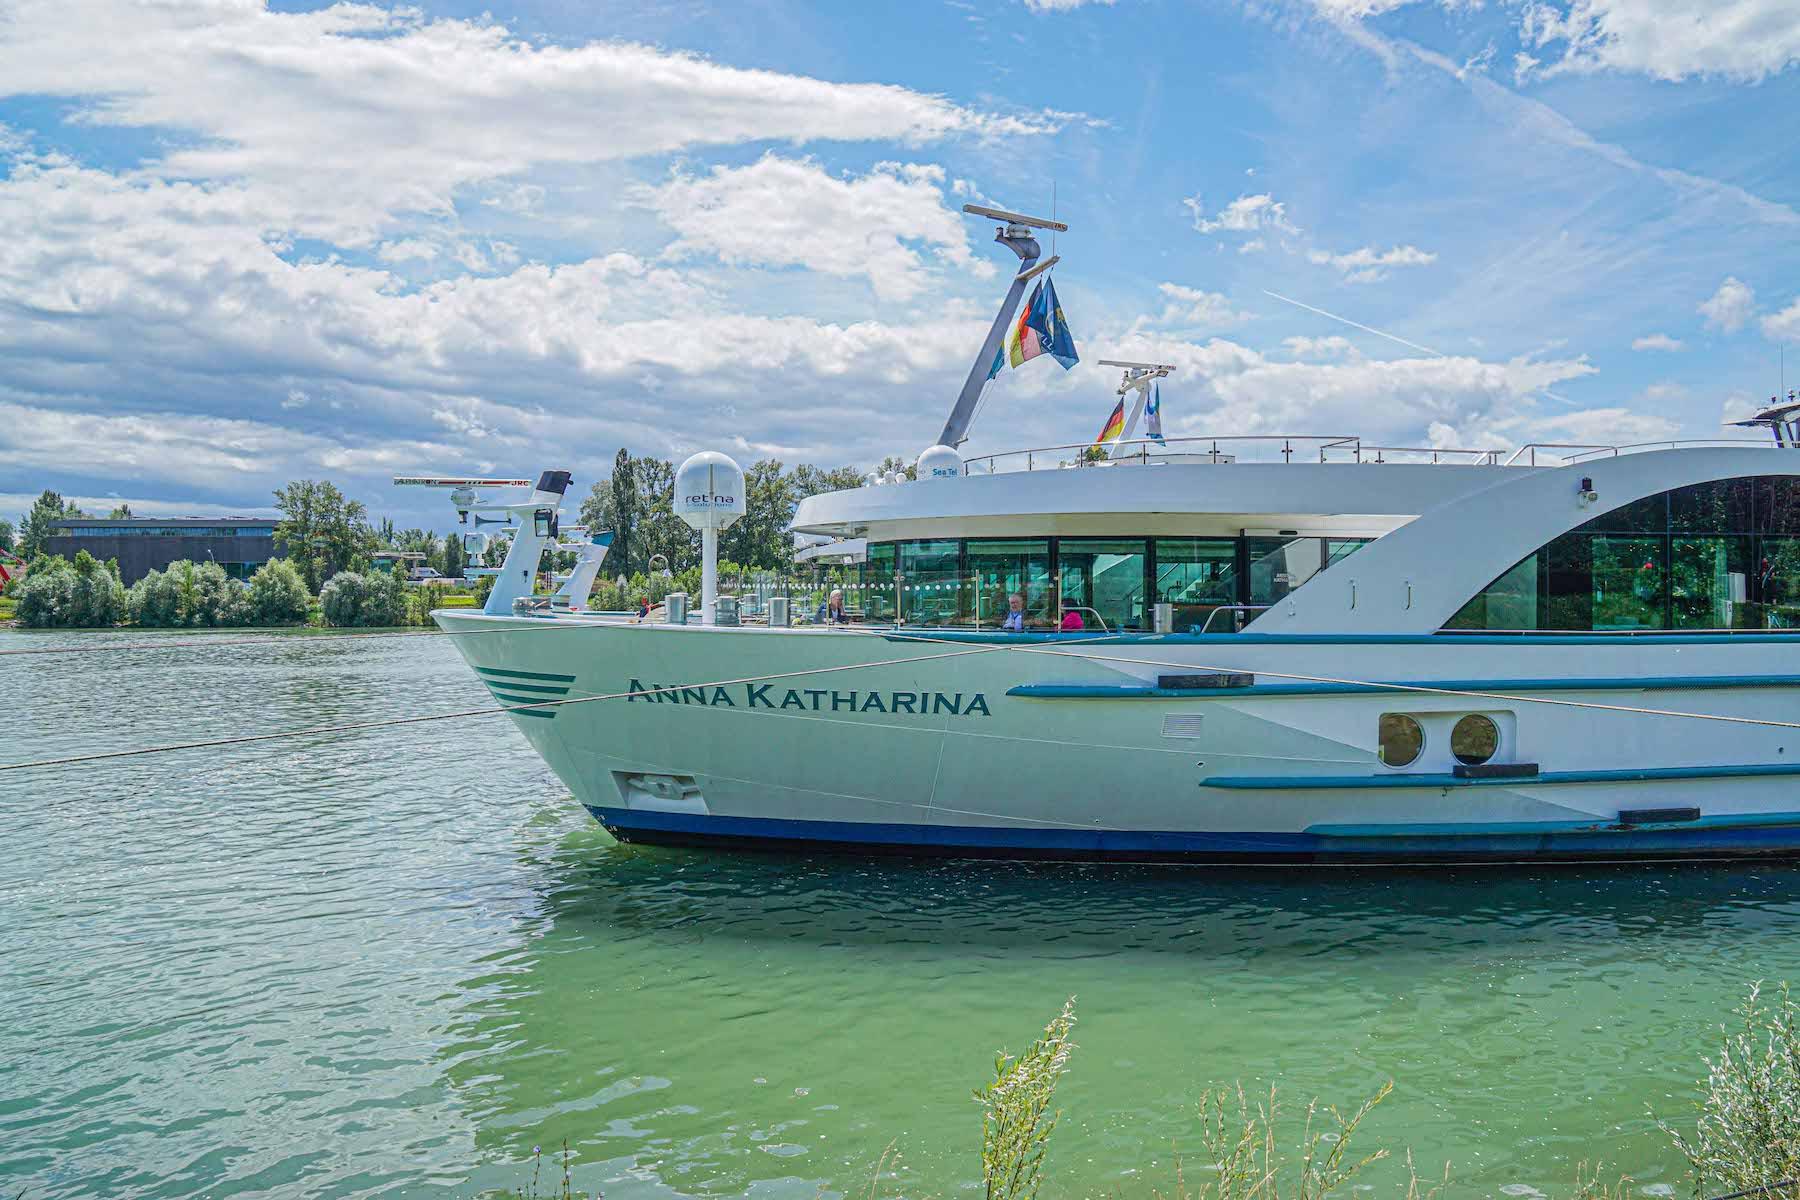 MS Anna Katharina Reisebericht Teil 2: Breisach & Basel